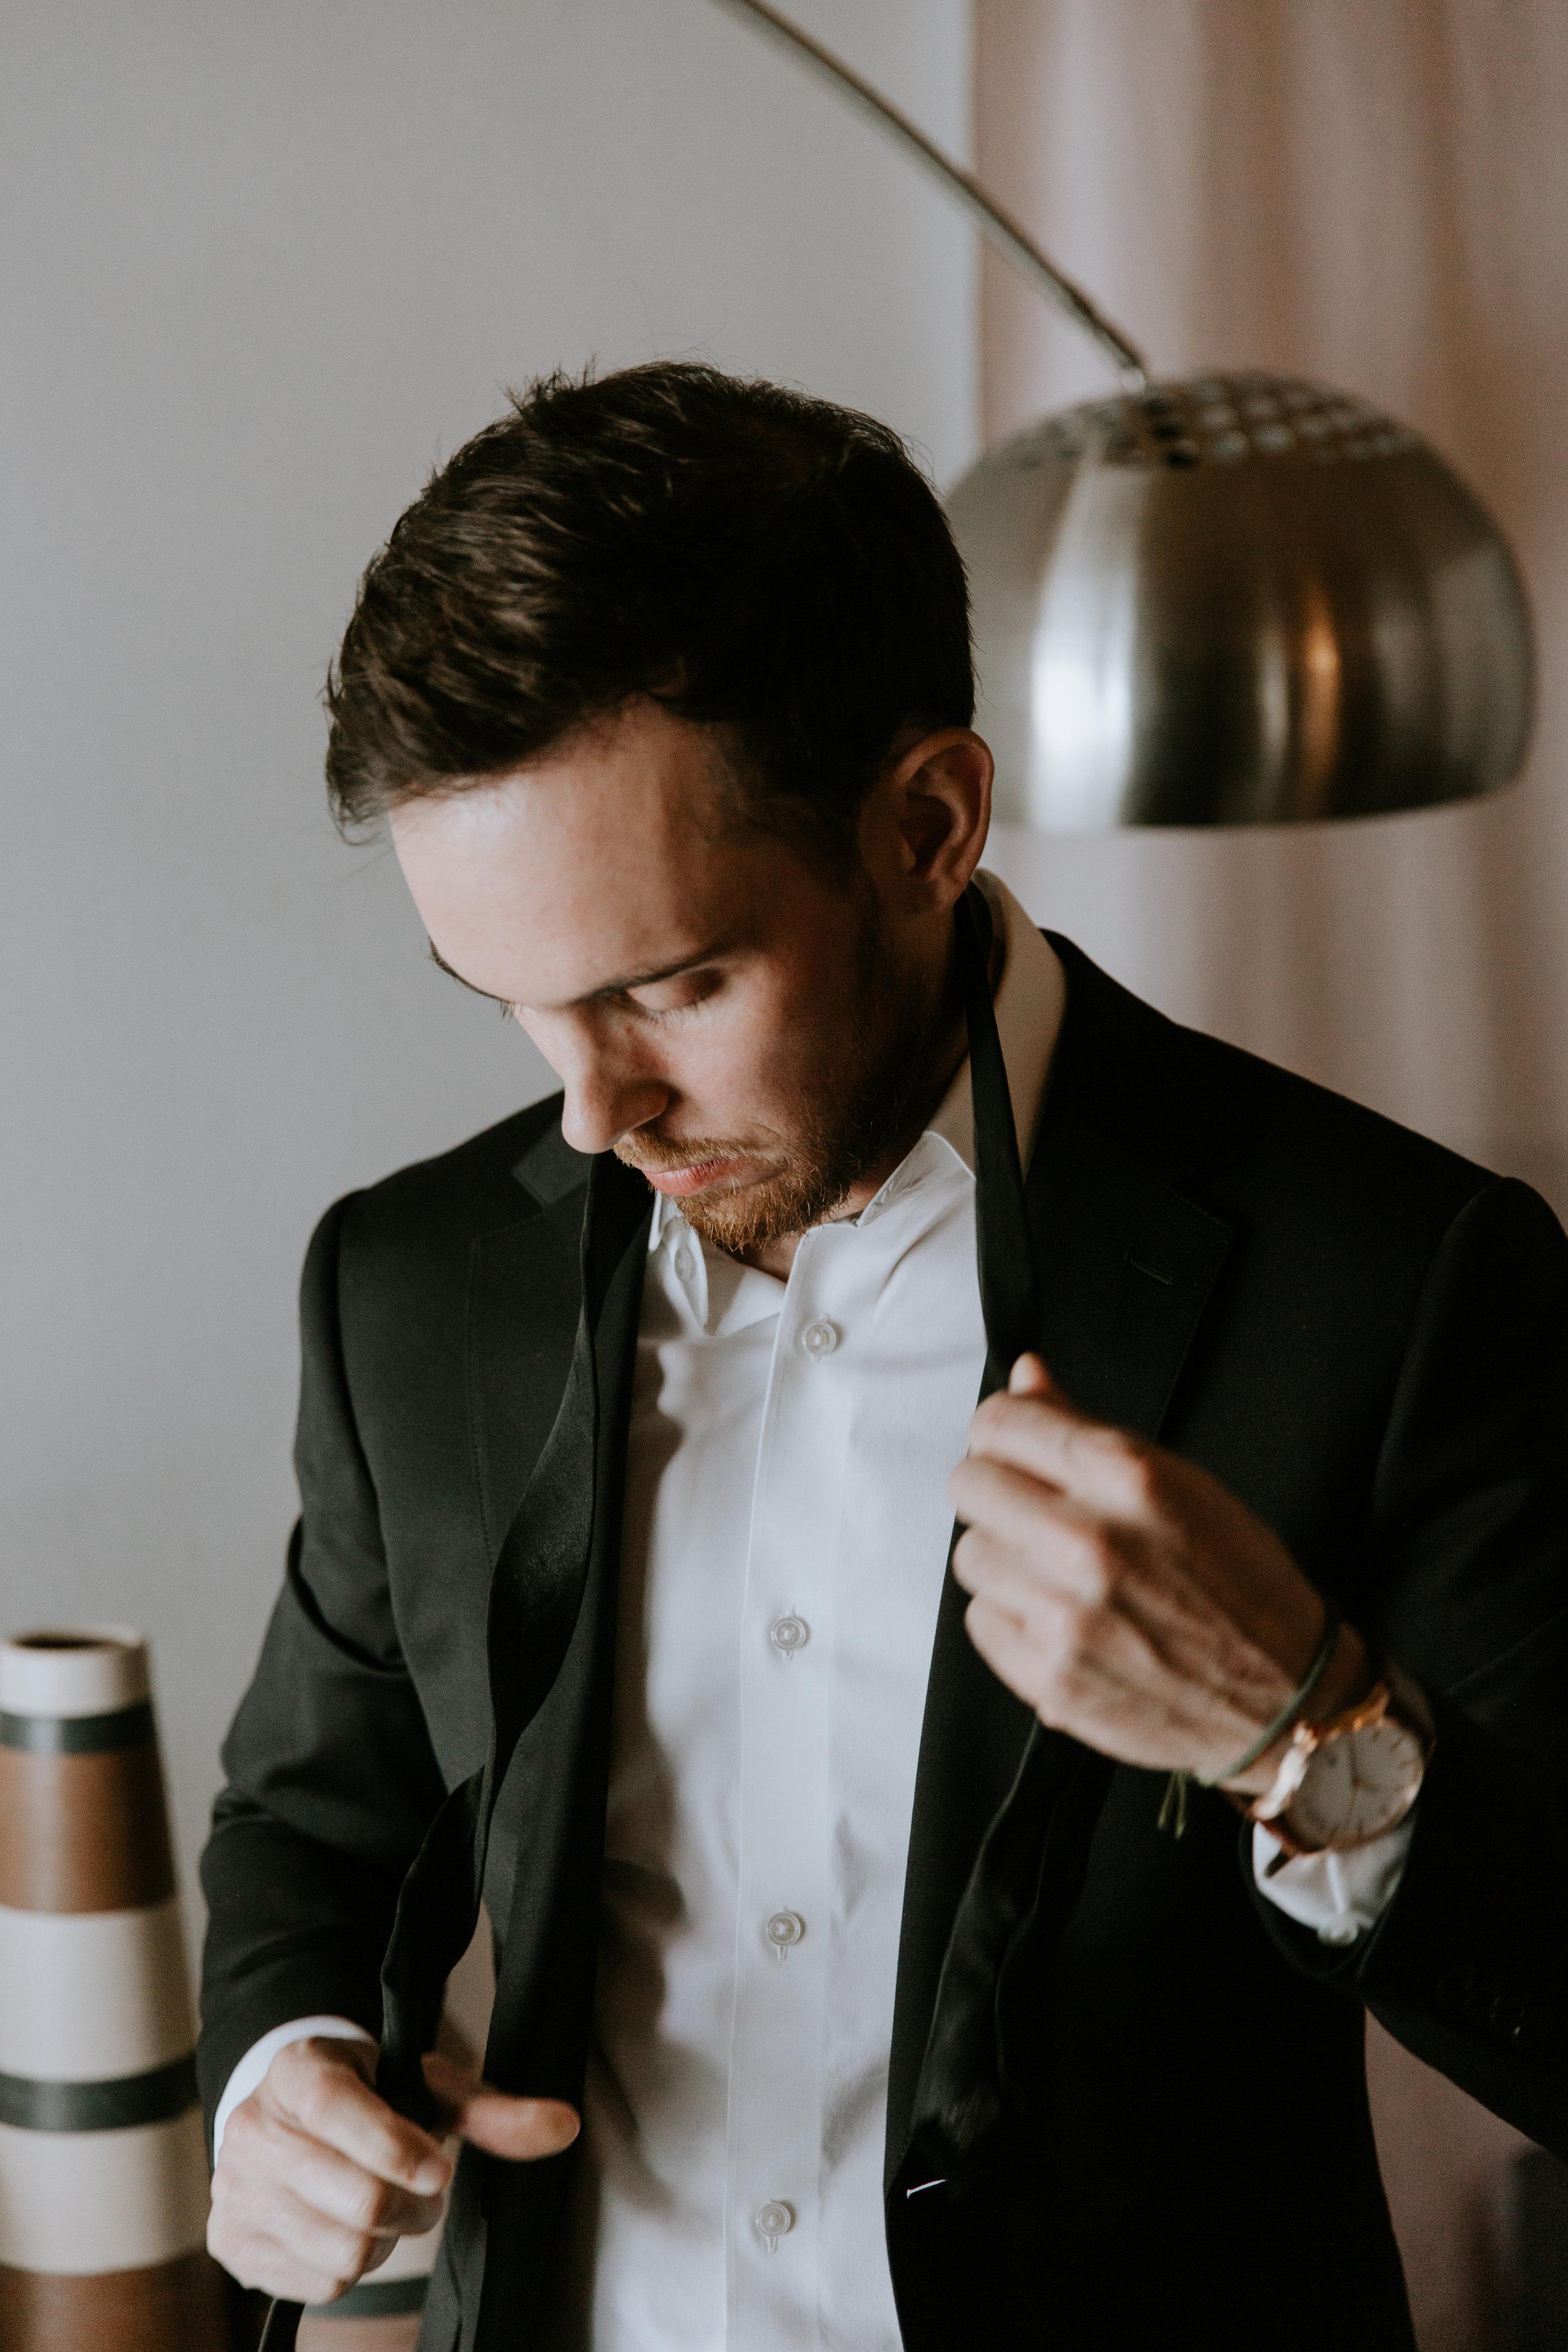 2019-05-26_Callie-Evan_Wedding_Joshua Tree_Paige Nelson_PREVIEWS HR-12.jpg